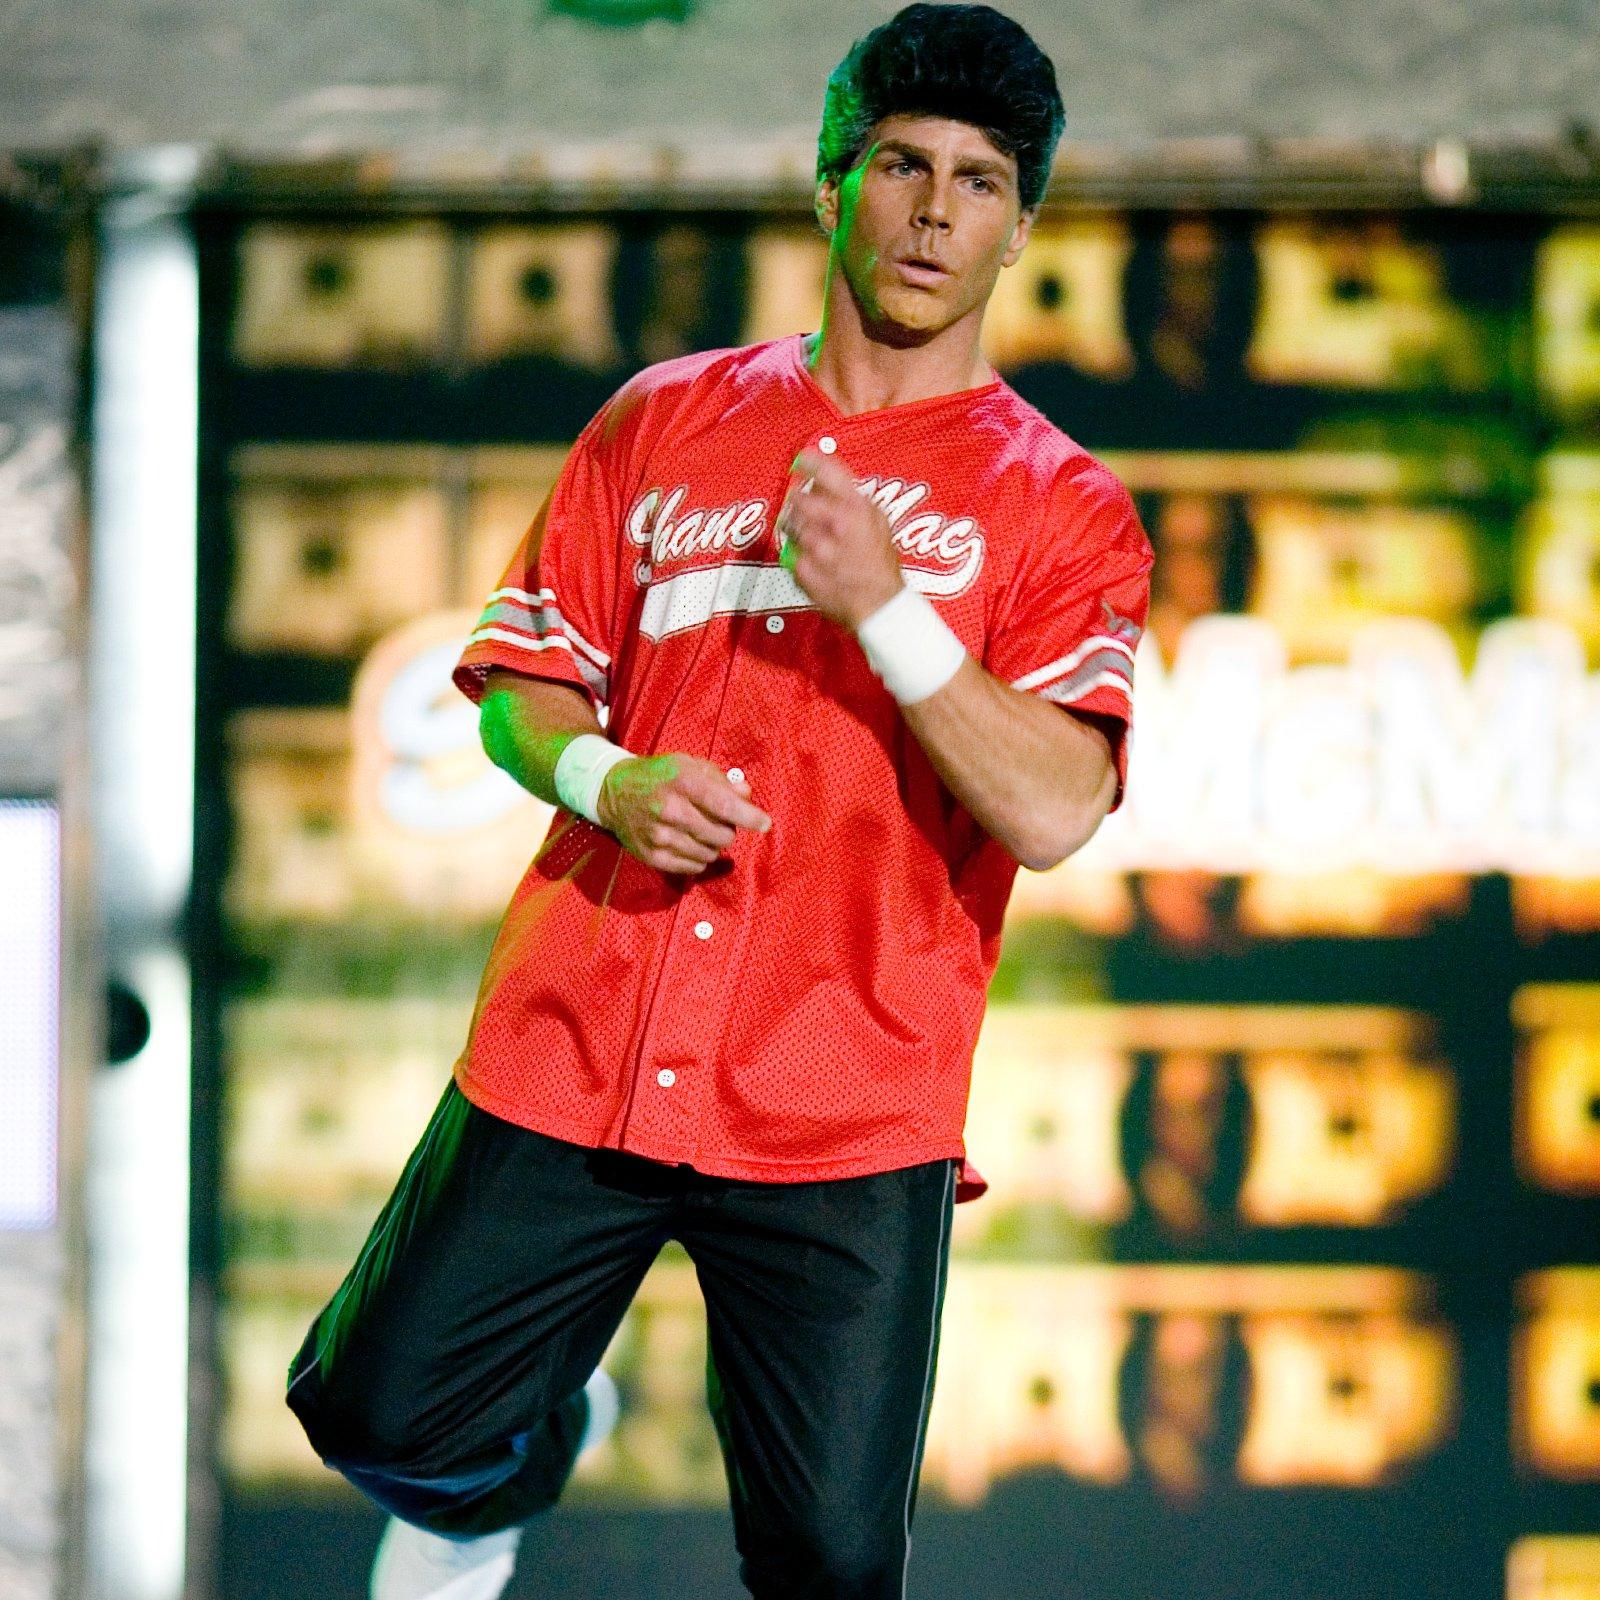 Shawn Michaels as Shane McMahon